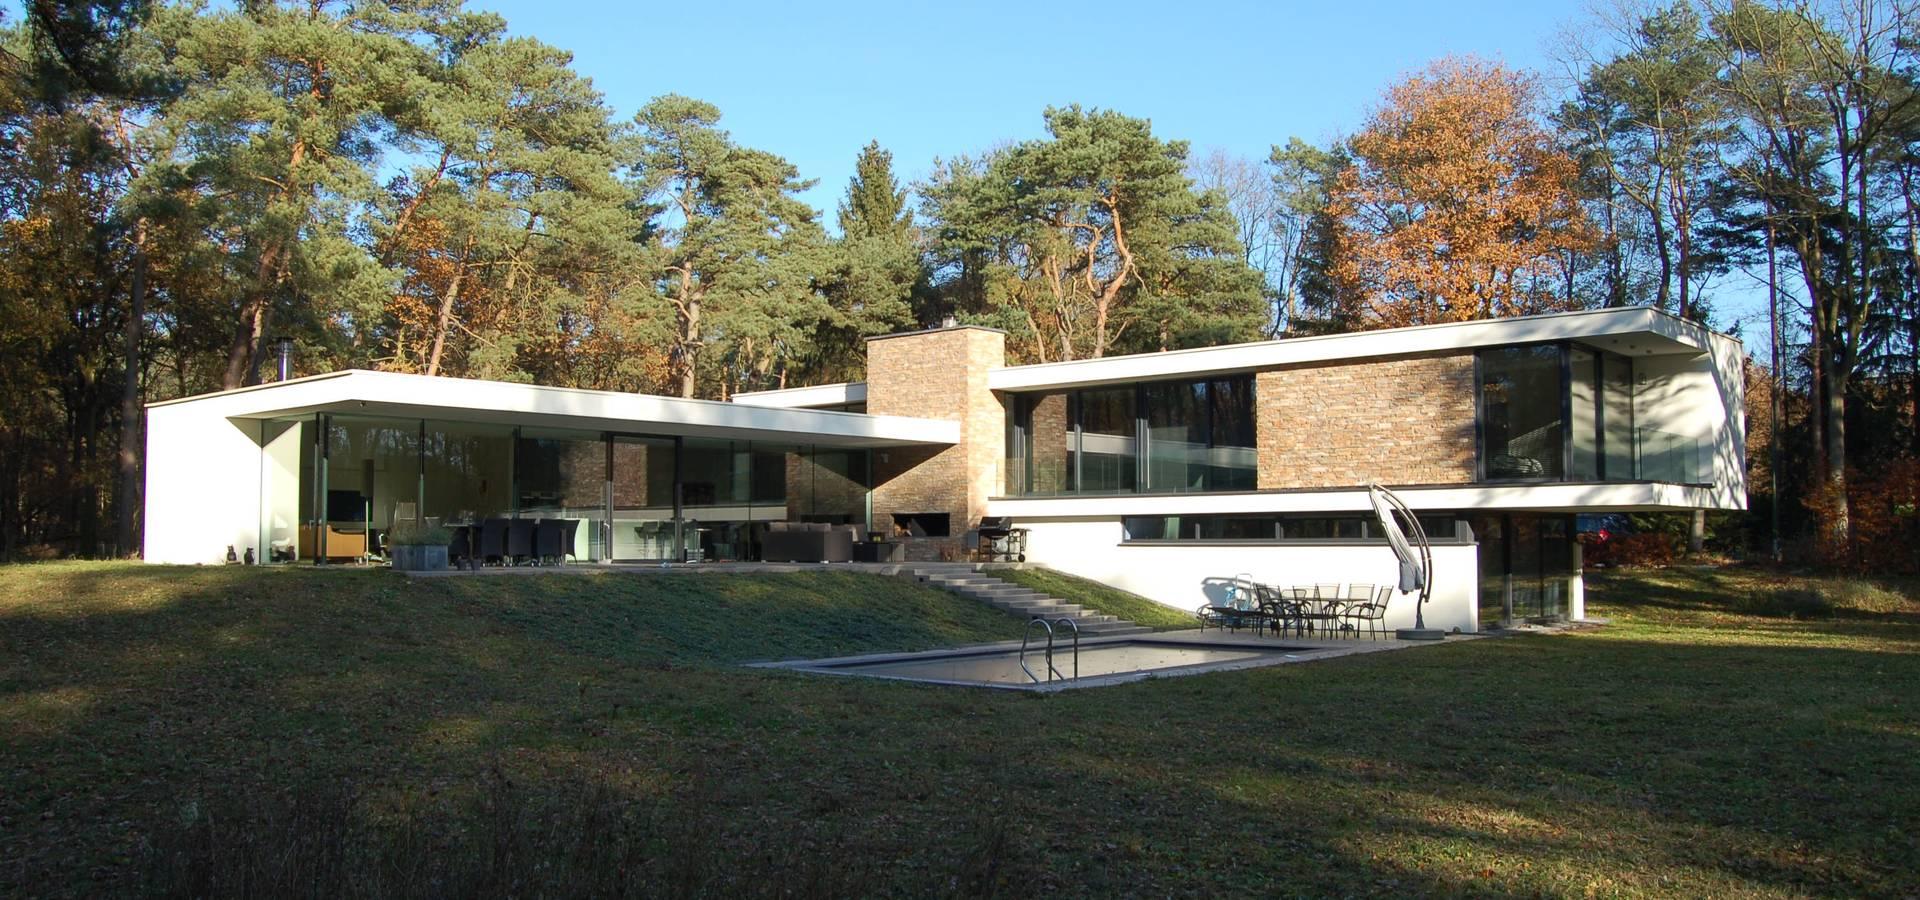 Margry | Arts architecten bna